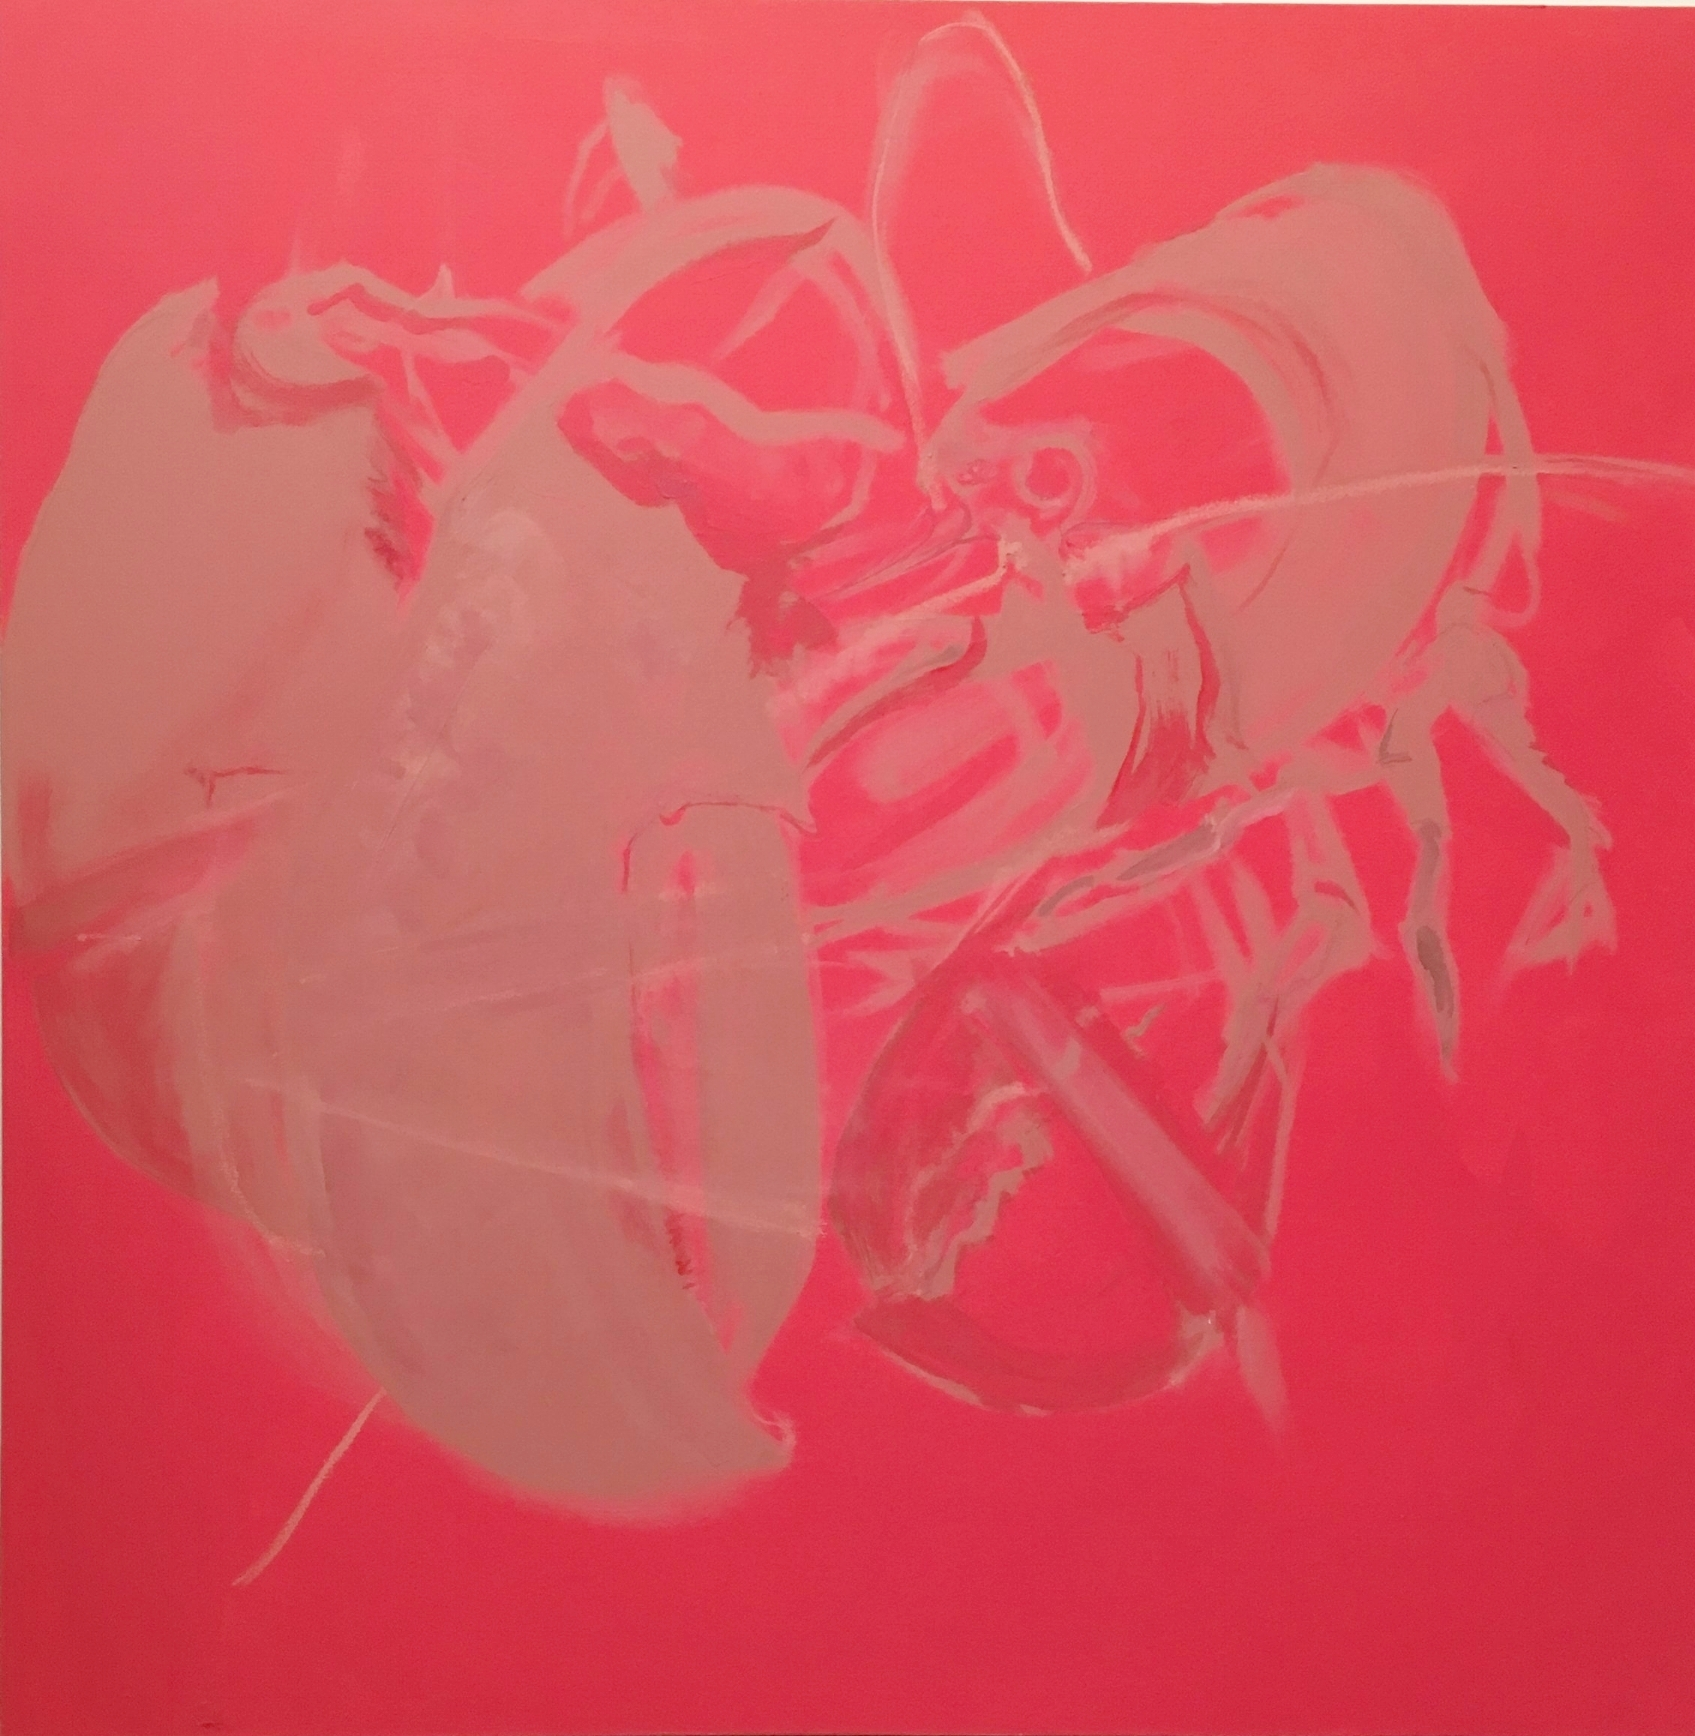 oil, liquid rubber, house paint on canvas 48x48